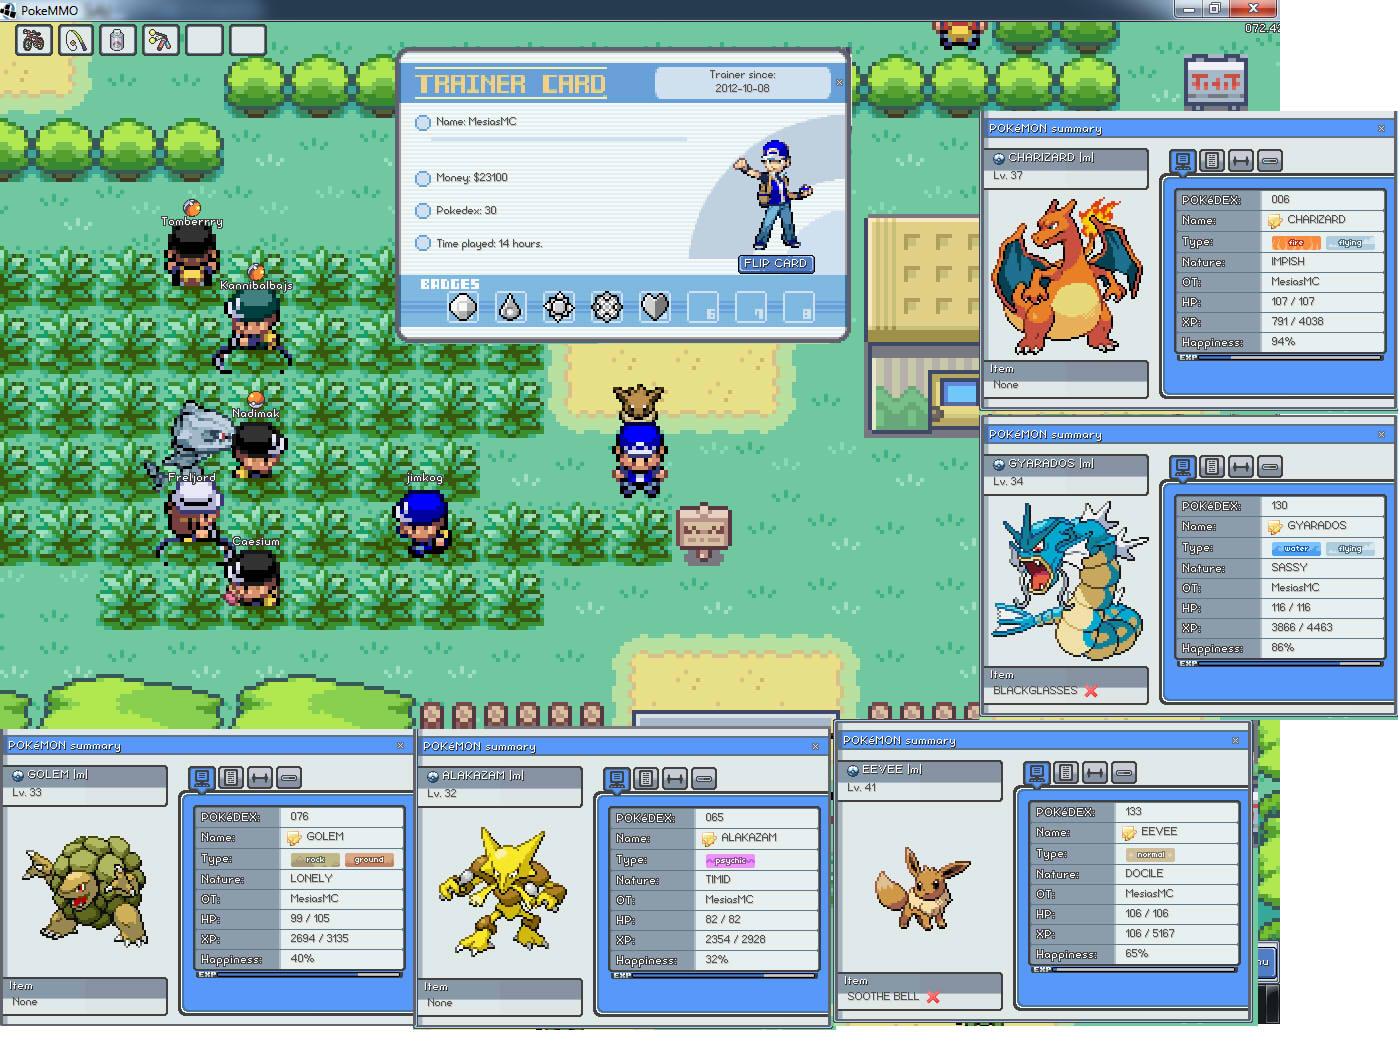 Pokemon Online | PokeMMO Gratis | Soy Otaku - Noticias sobre anime ...: www.soyotaku.com/2012/10/pokemon-online-pokemmo-gratis.html